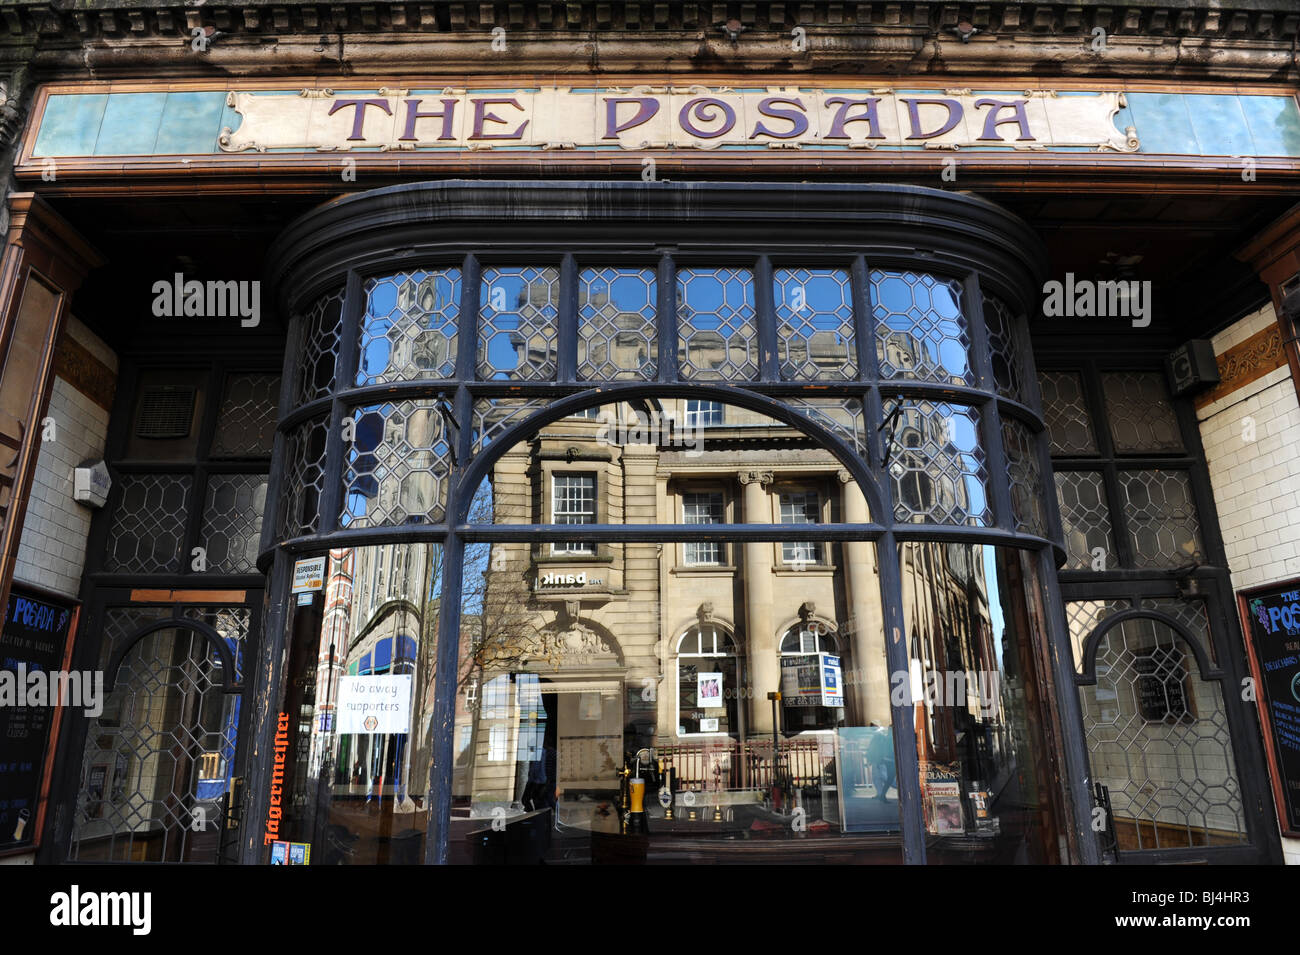 Le Posada Pub à Lichfield Street Wolverhampton Uk Photo Stock